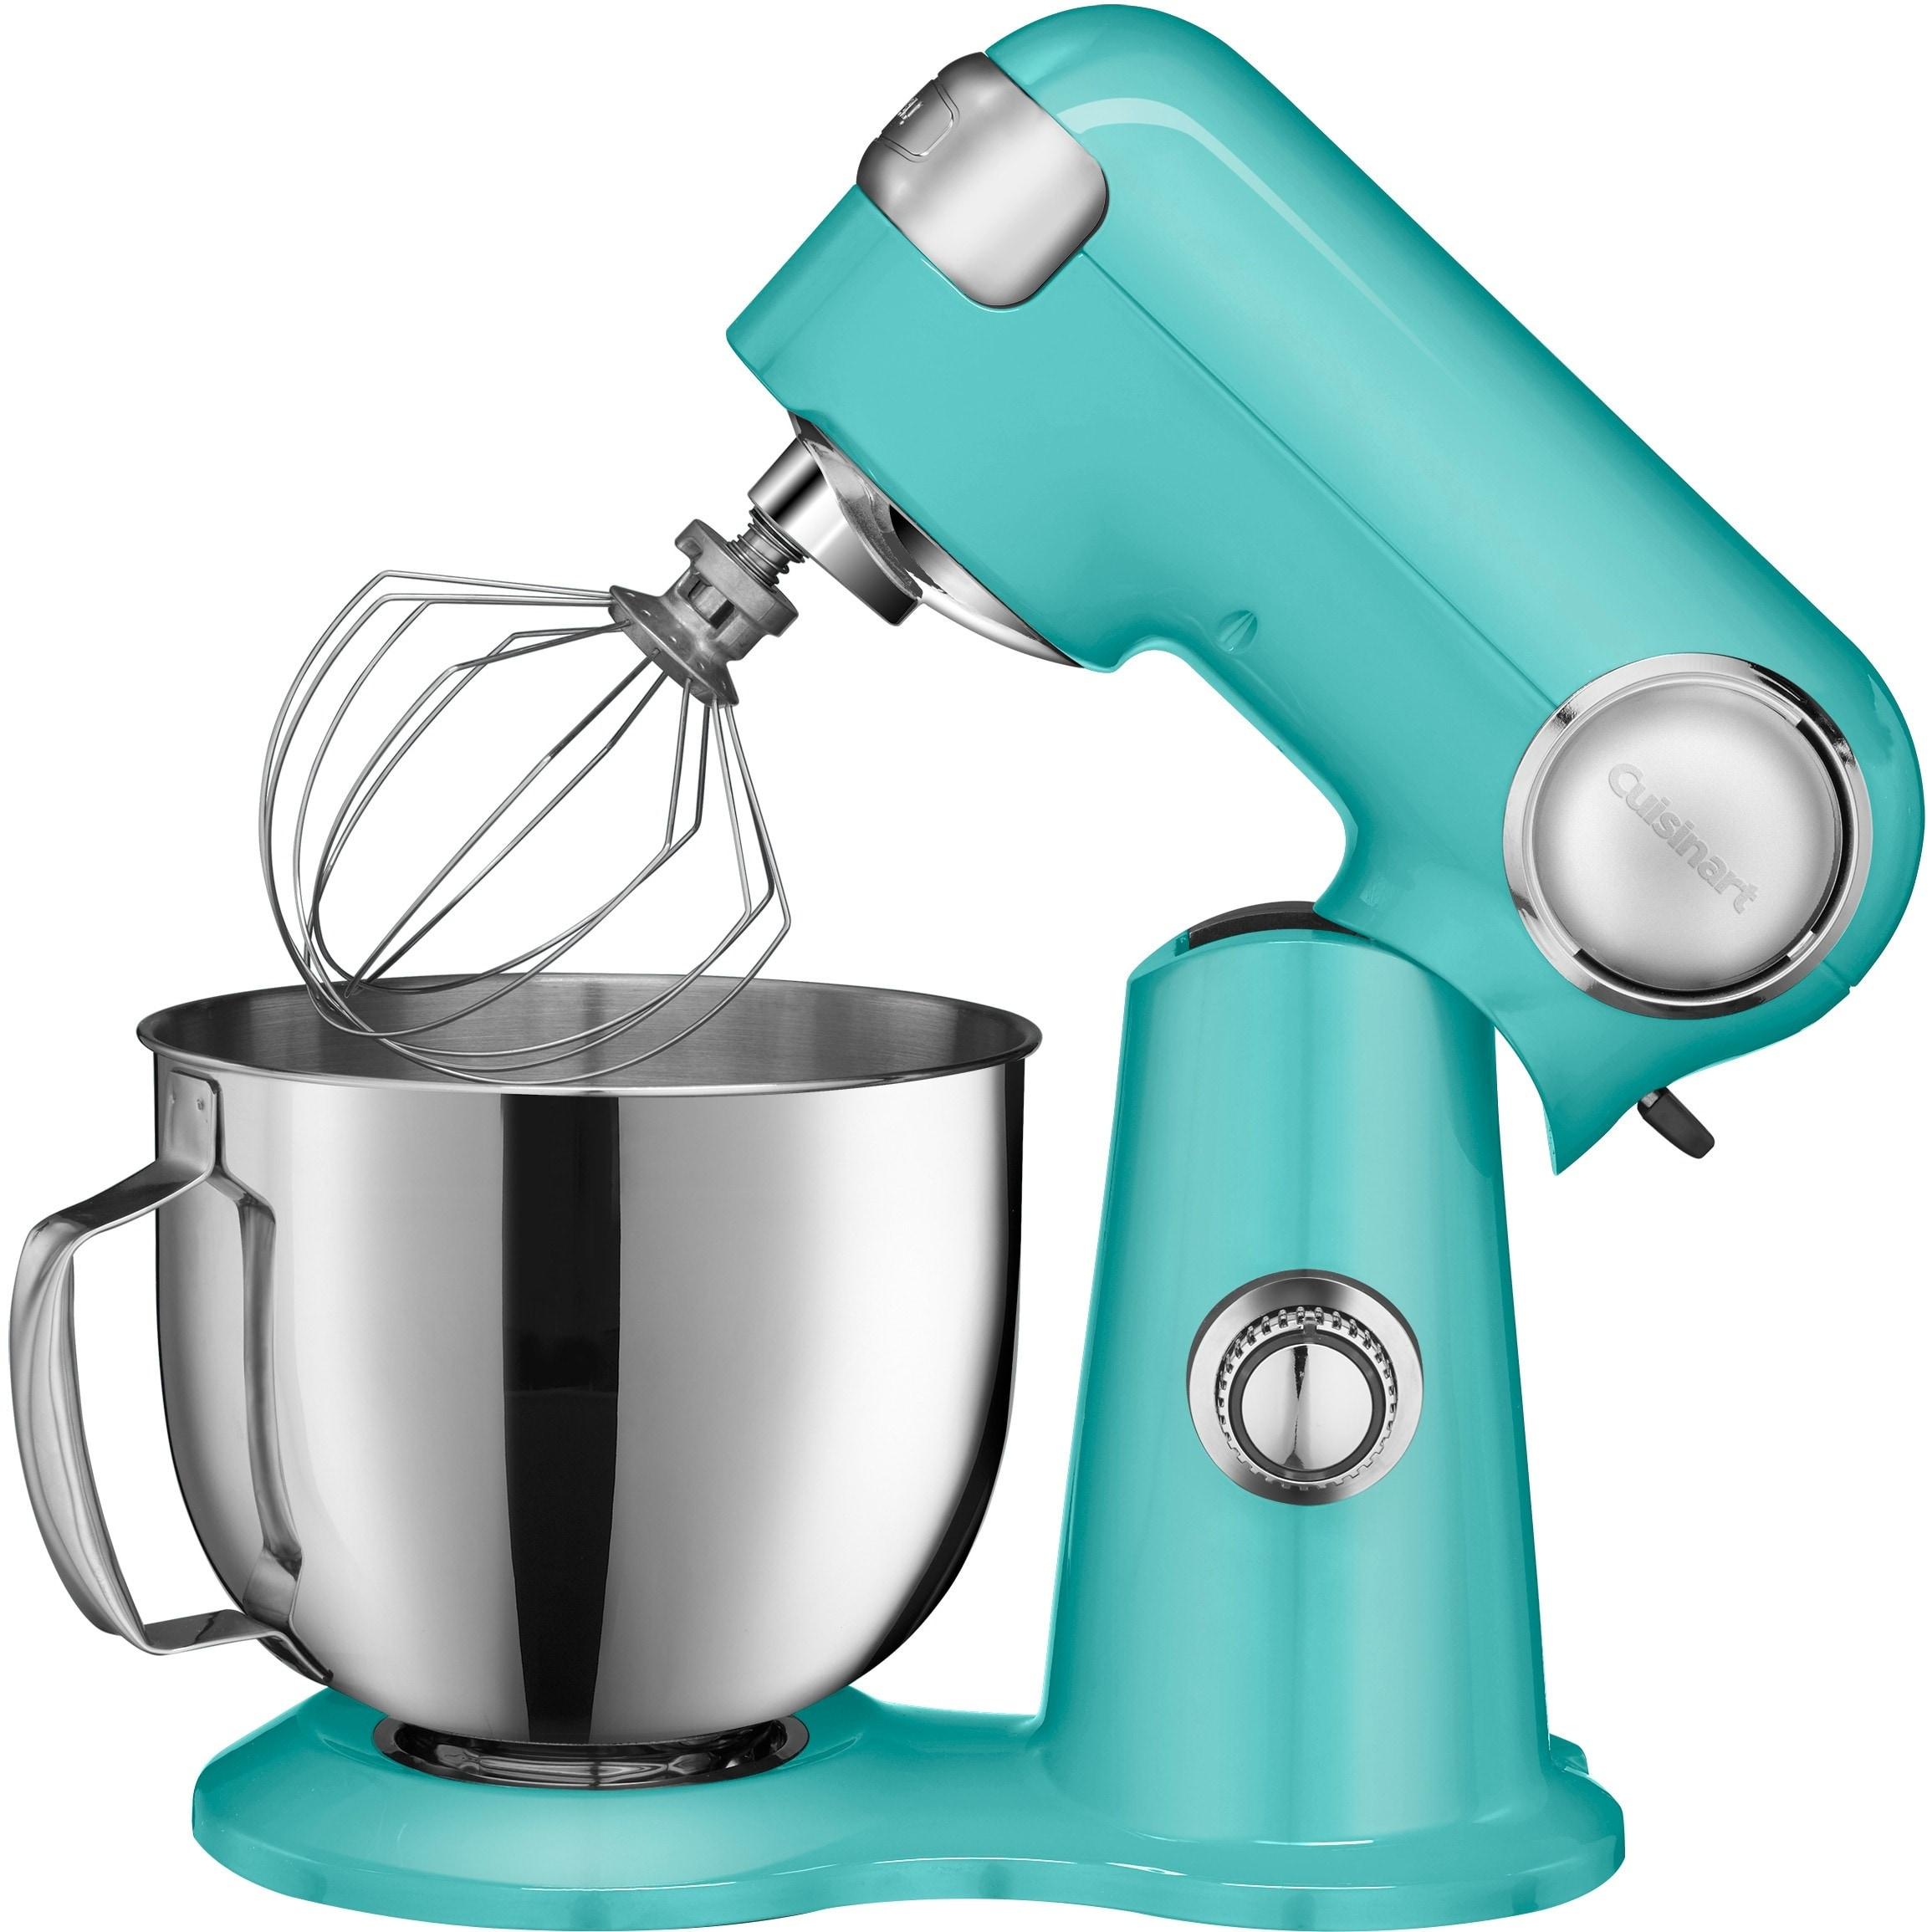 Buy Cuisinart Kitchen Mixers Online at Overstock.com | Our Best ...